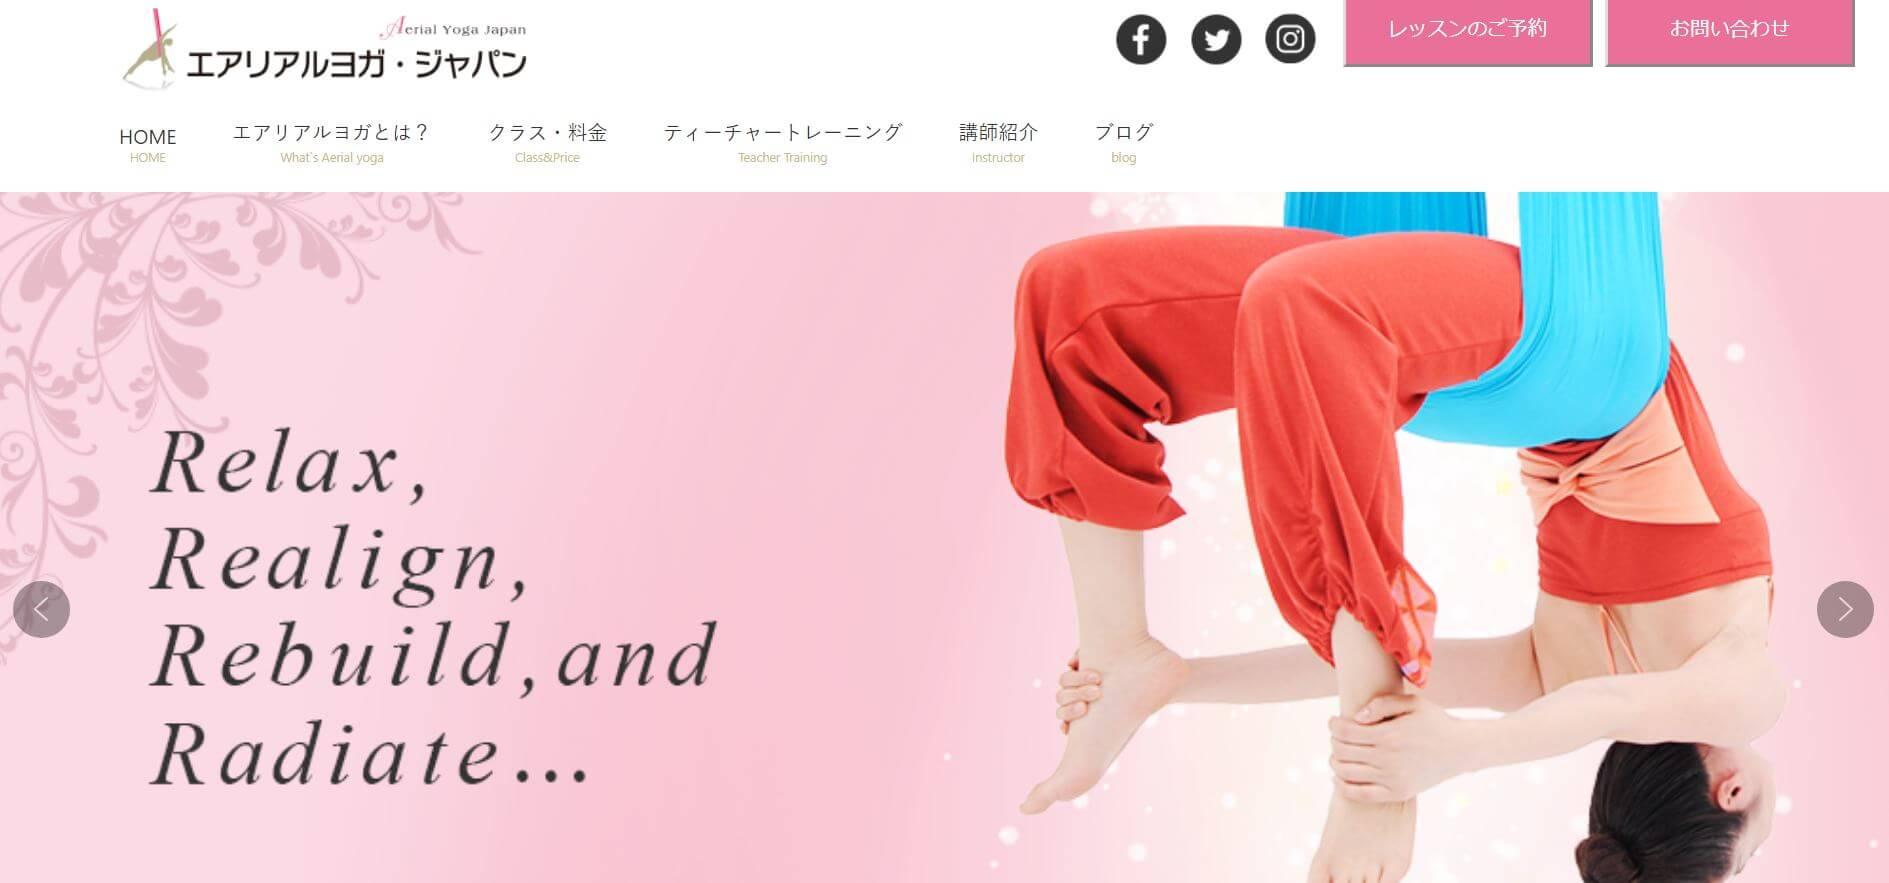 Aerial Yoga Japan